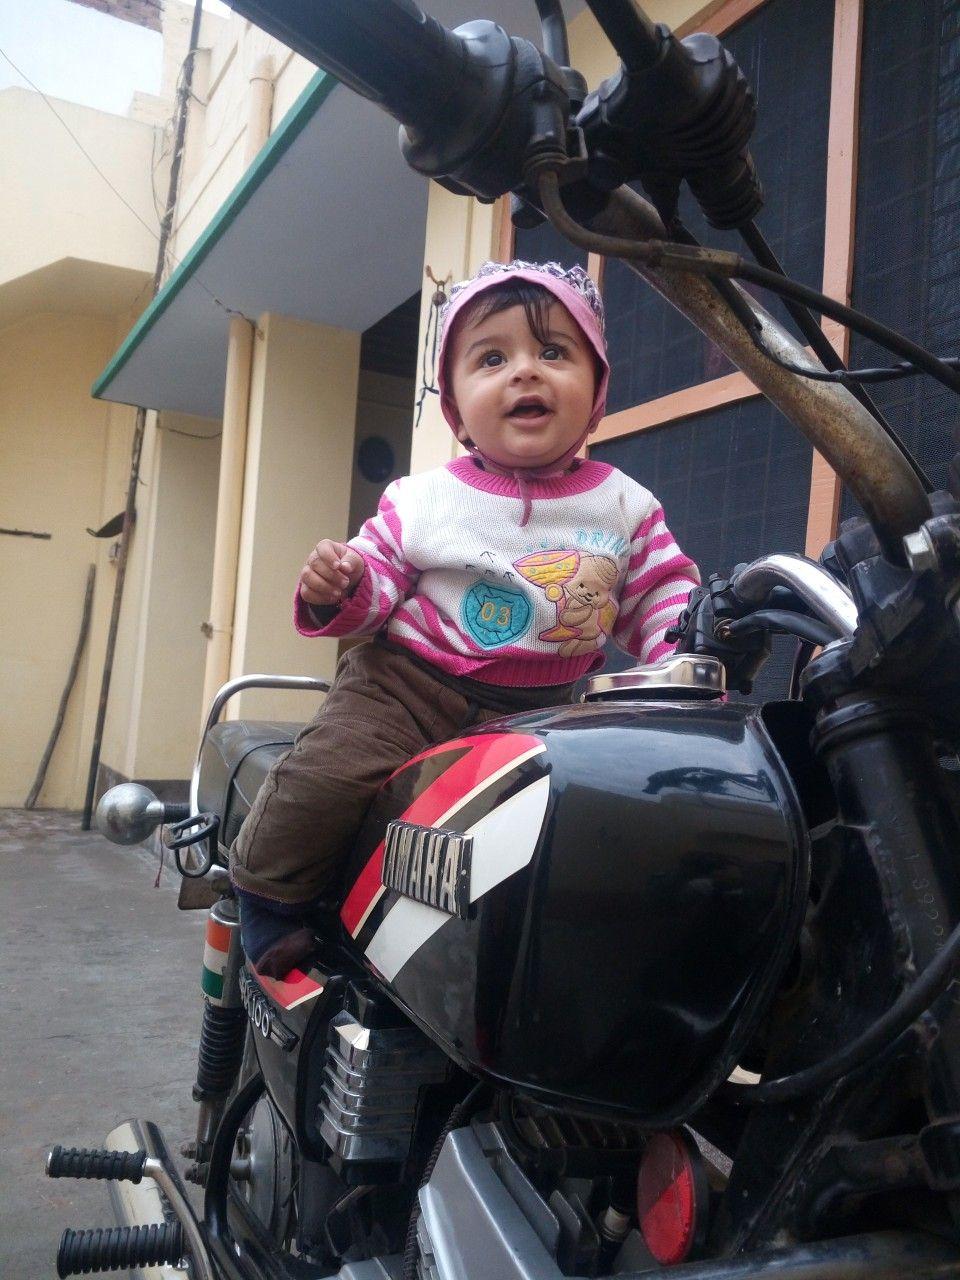 Pin by Samking dodge on YAMAHA India in 2020 Baby